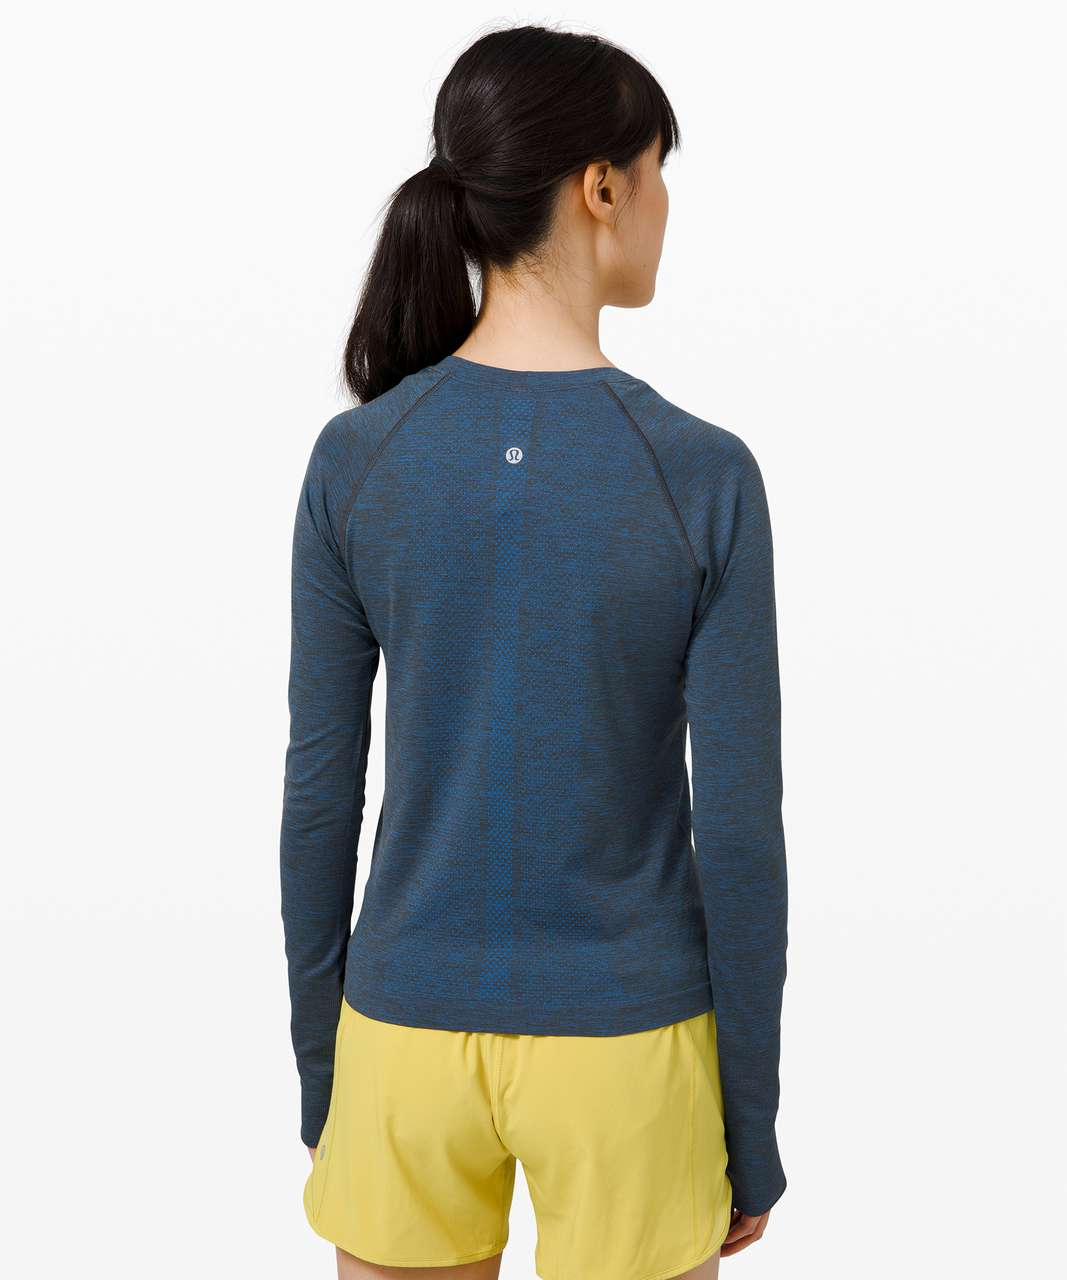 Lululemon Swiftly Tech Long Sleeve 2.0 *Race - Wild Bluebell / Graphite Grey